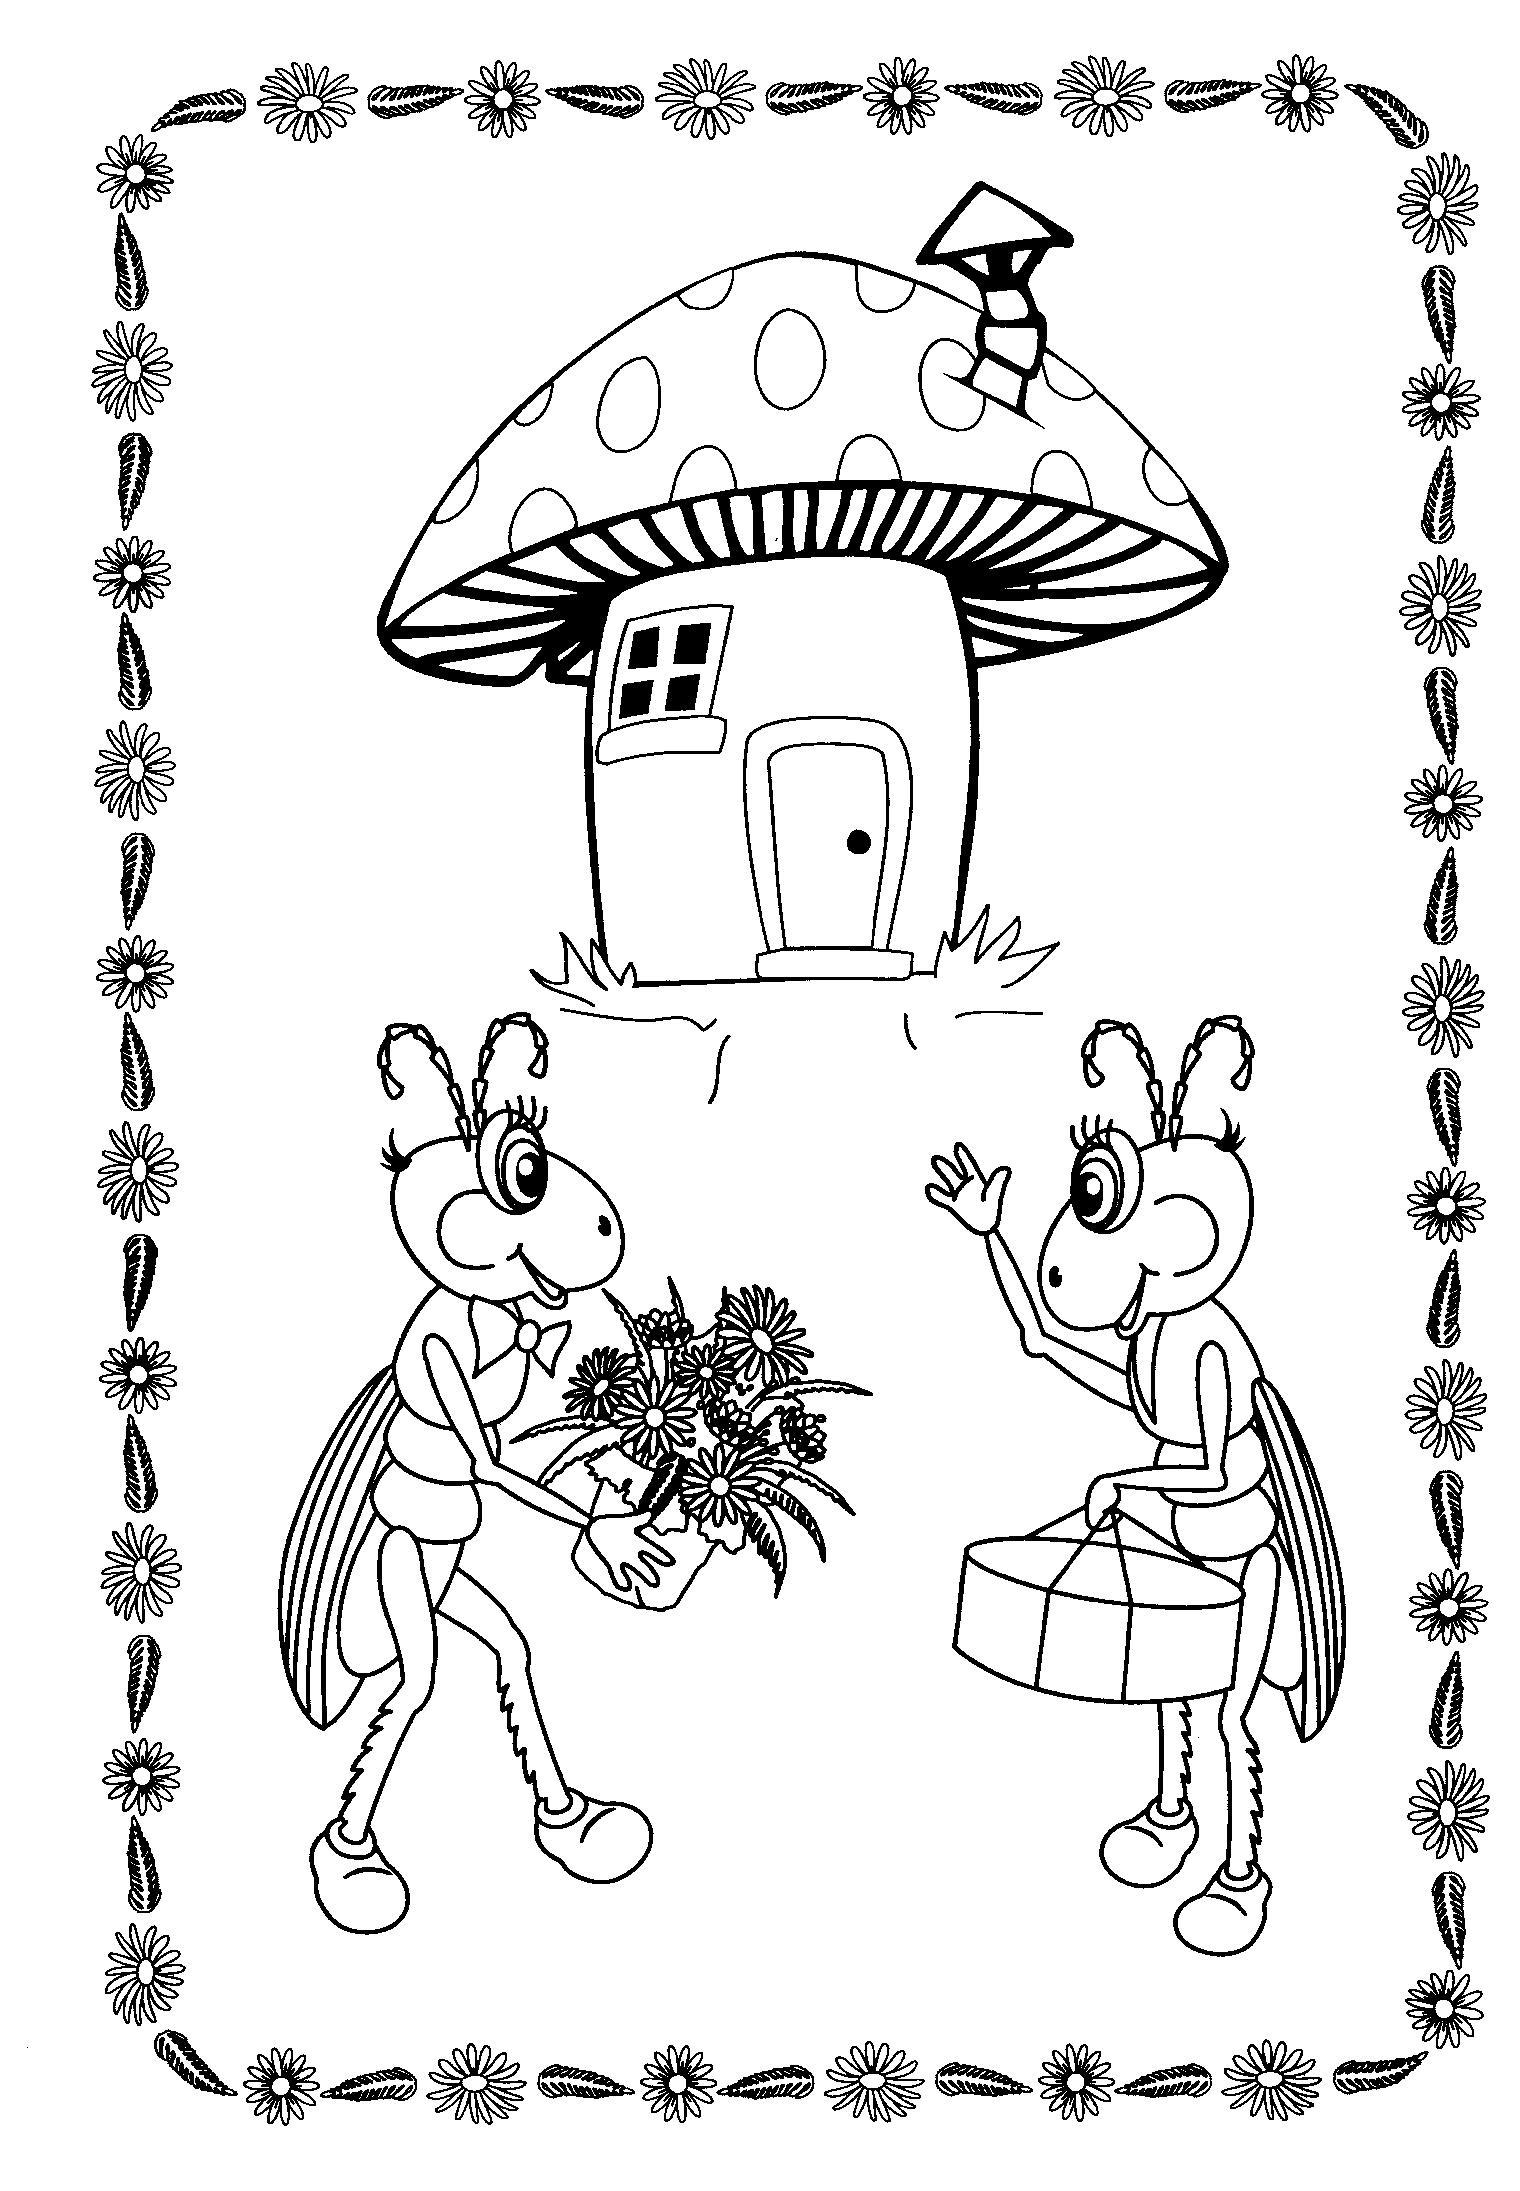 Жуки с подарками. домик-гриб